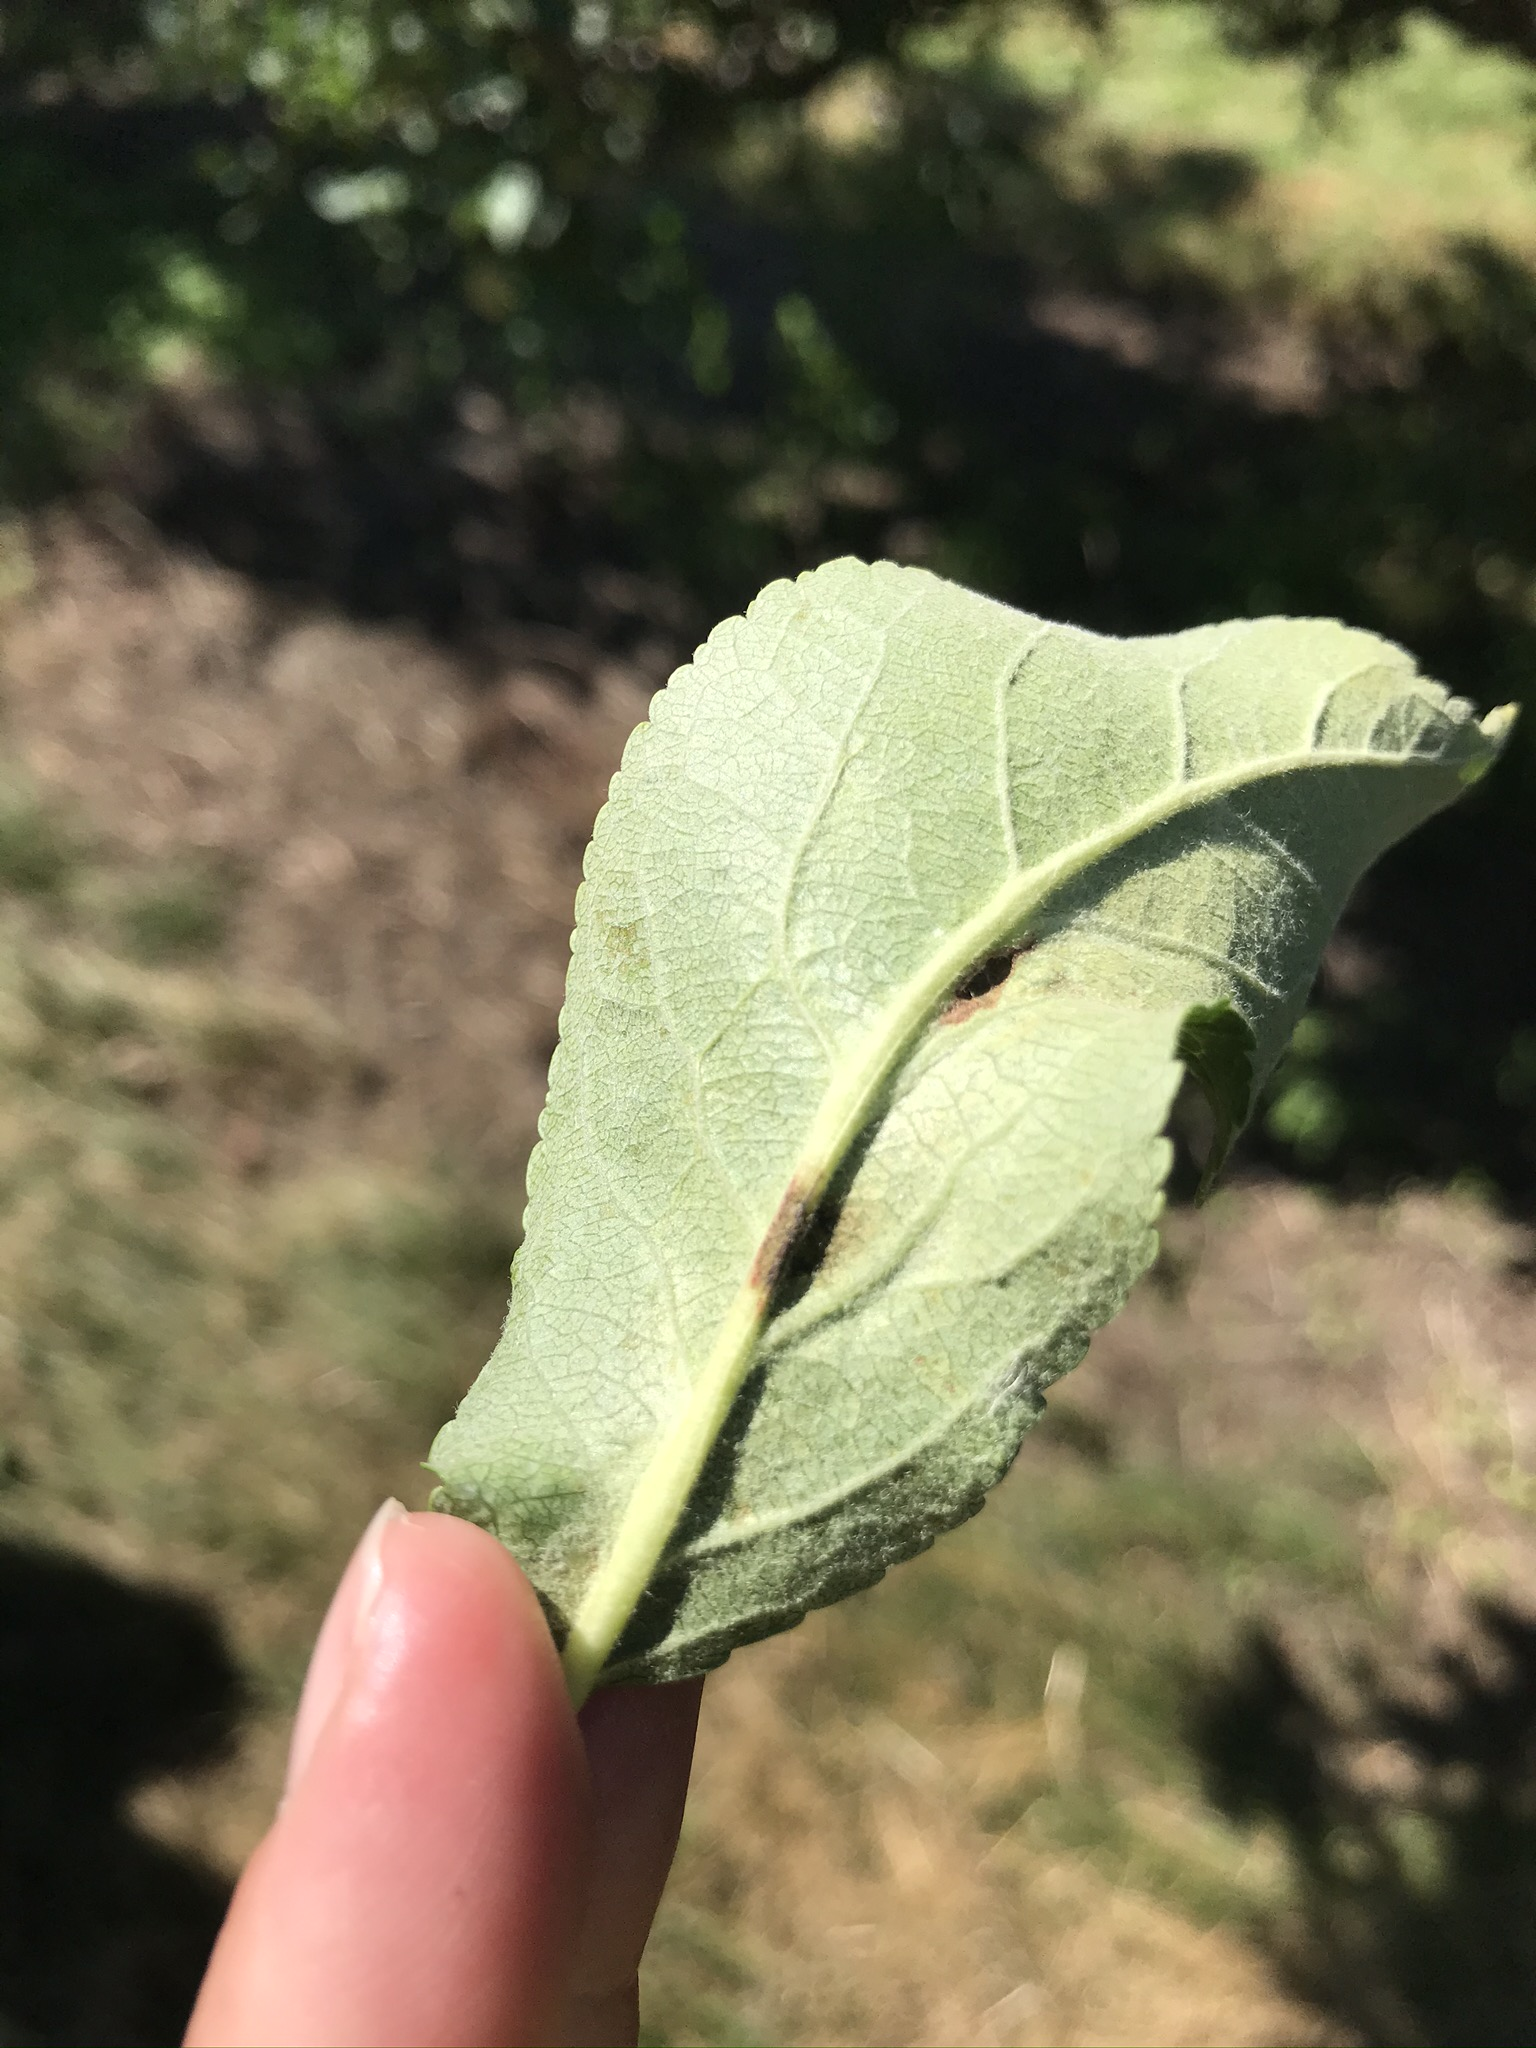 Apple scab lesion on underside of leaf.